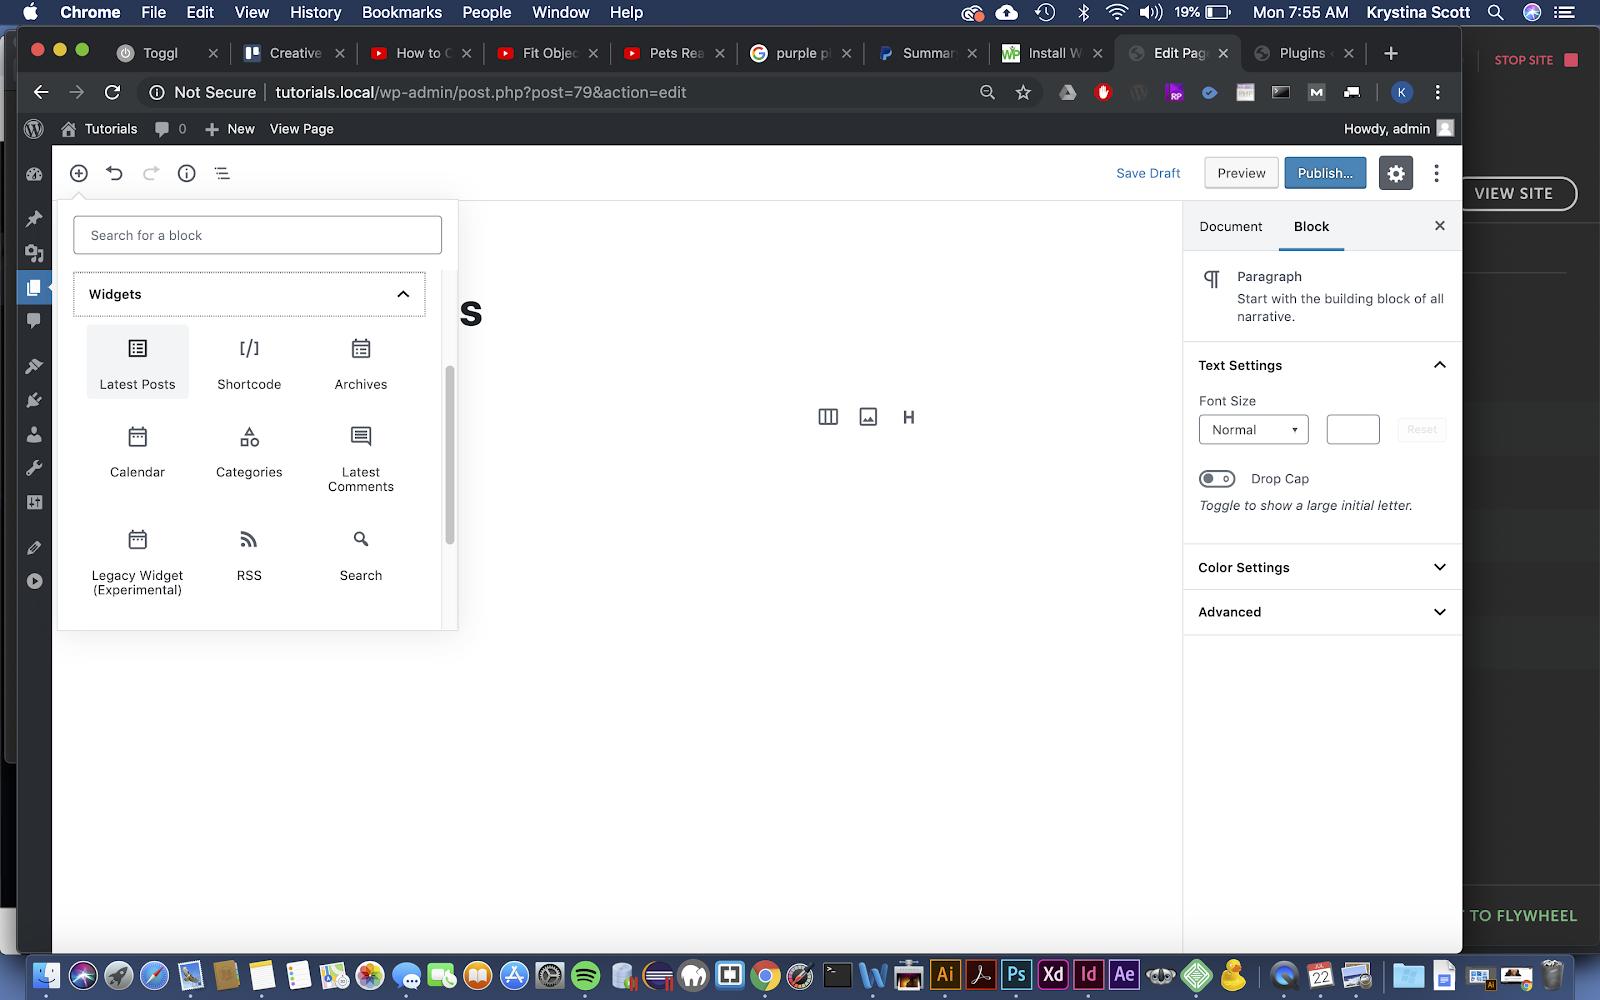 Latest WordPress Posts in Gutenberg Block Editor